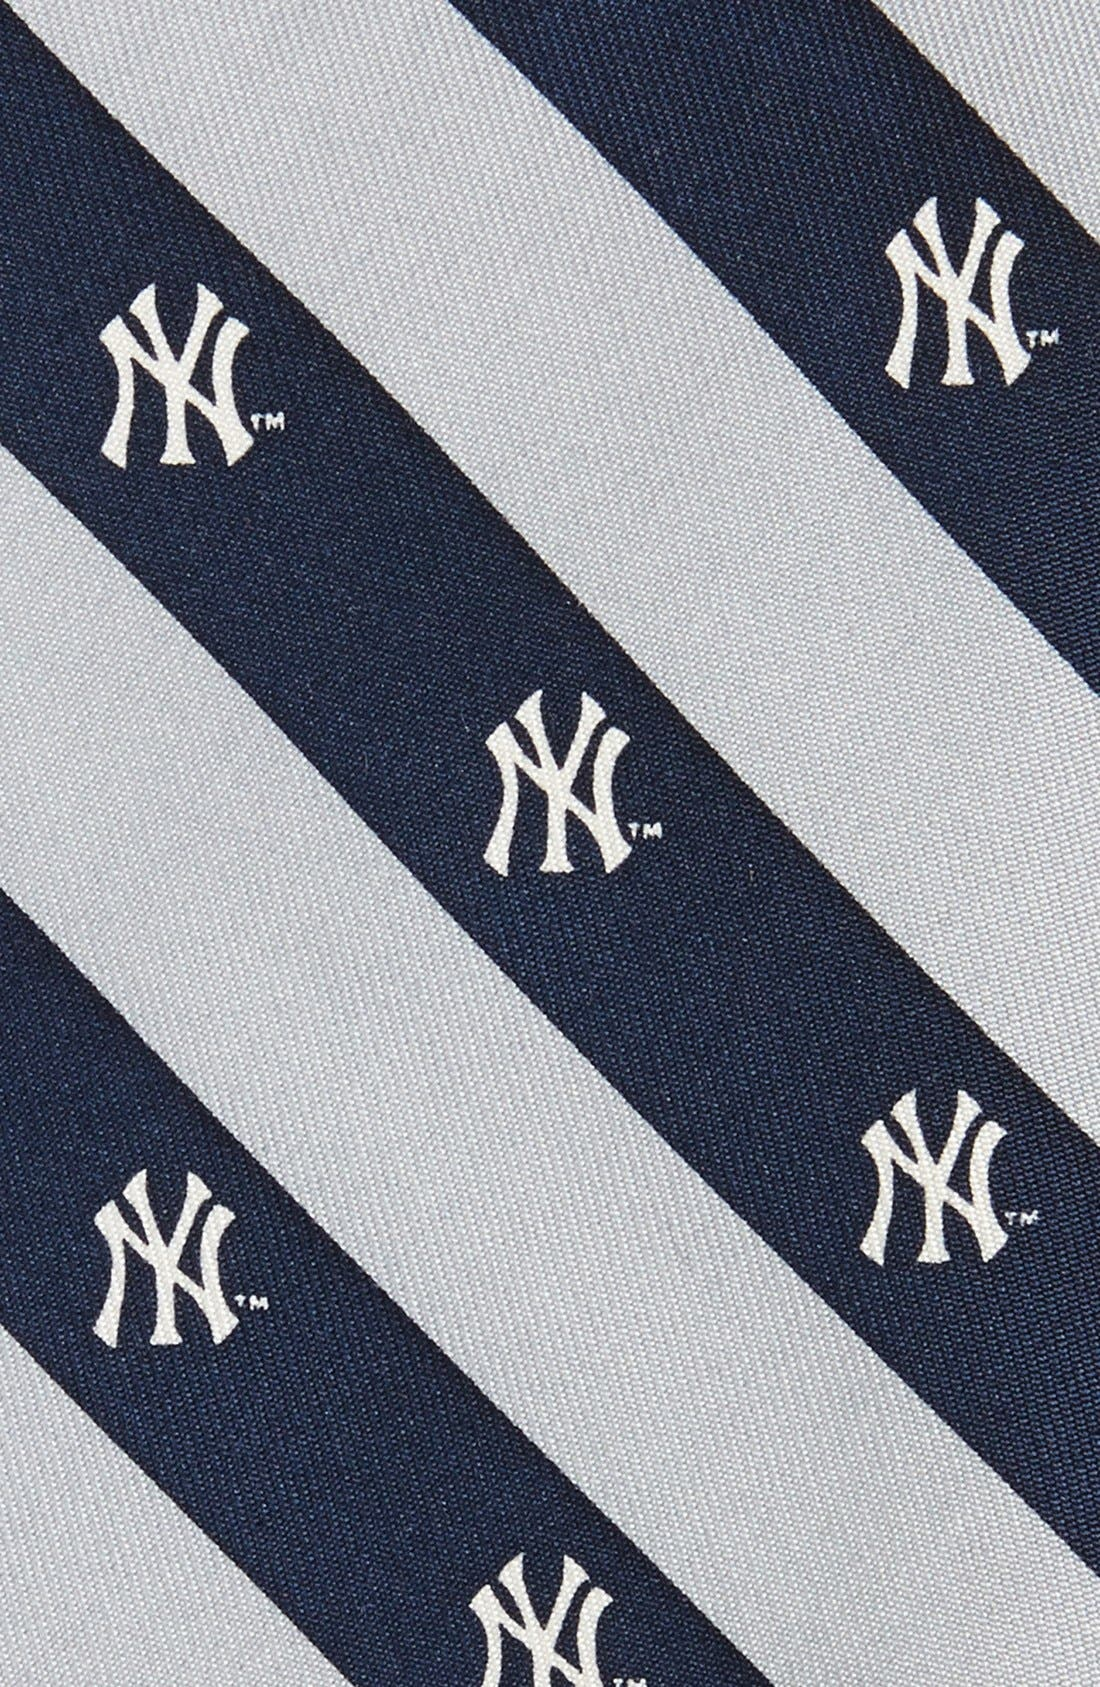 New York Yankees - MLB Print Silk Tie,                             Alternate thumbnail 2, color,                             414